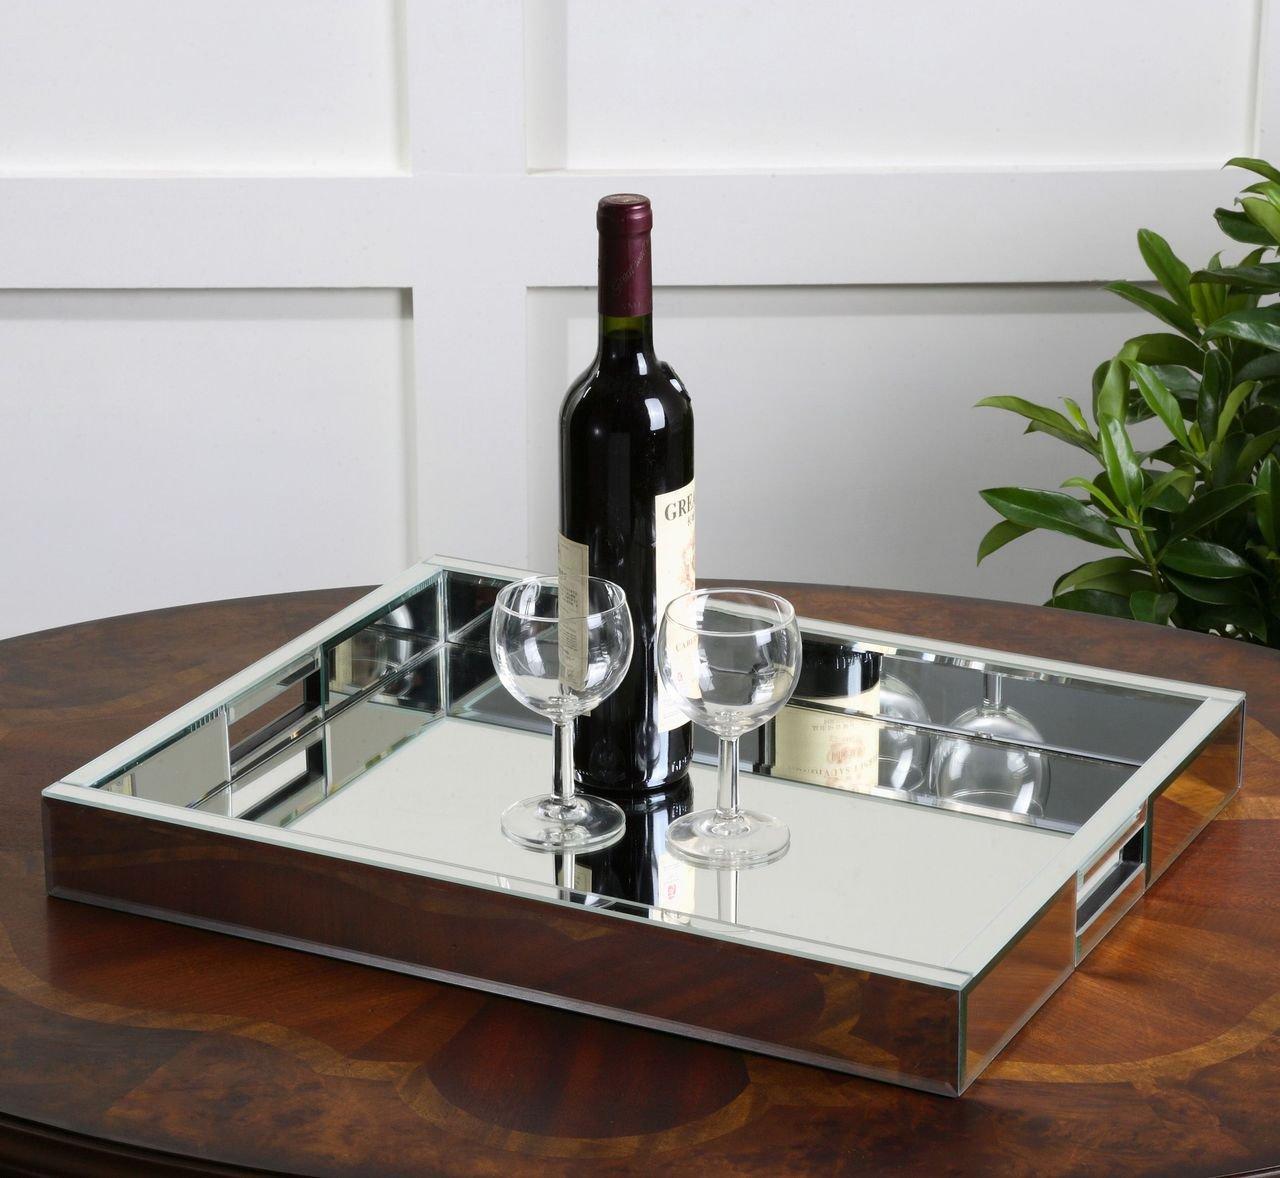 Amazon.com: Modern Mirrored Glass Serving Tray | Decorative Bar Handles:  Home & Kitchen - Amazon.com: Modern Mirrored Glass Serving Tray Decorative Bar